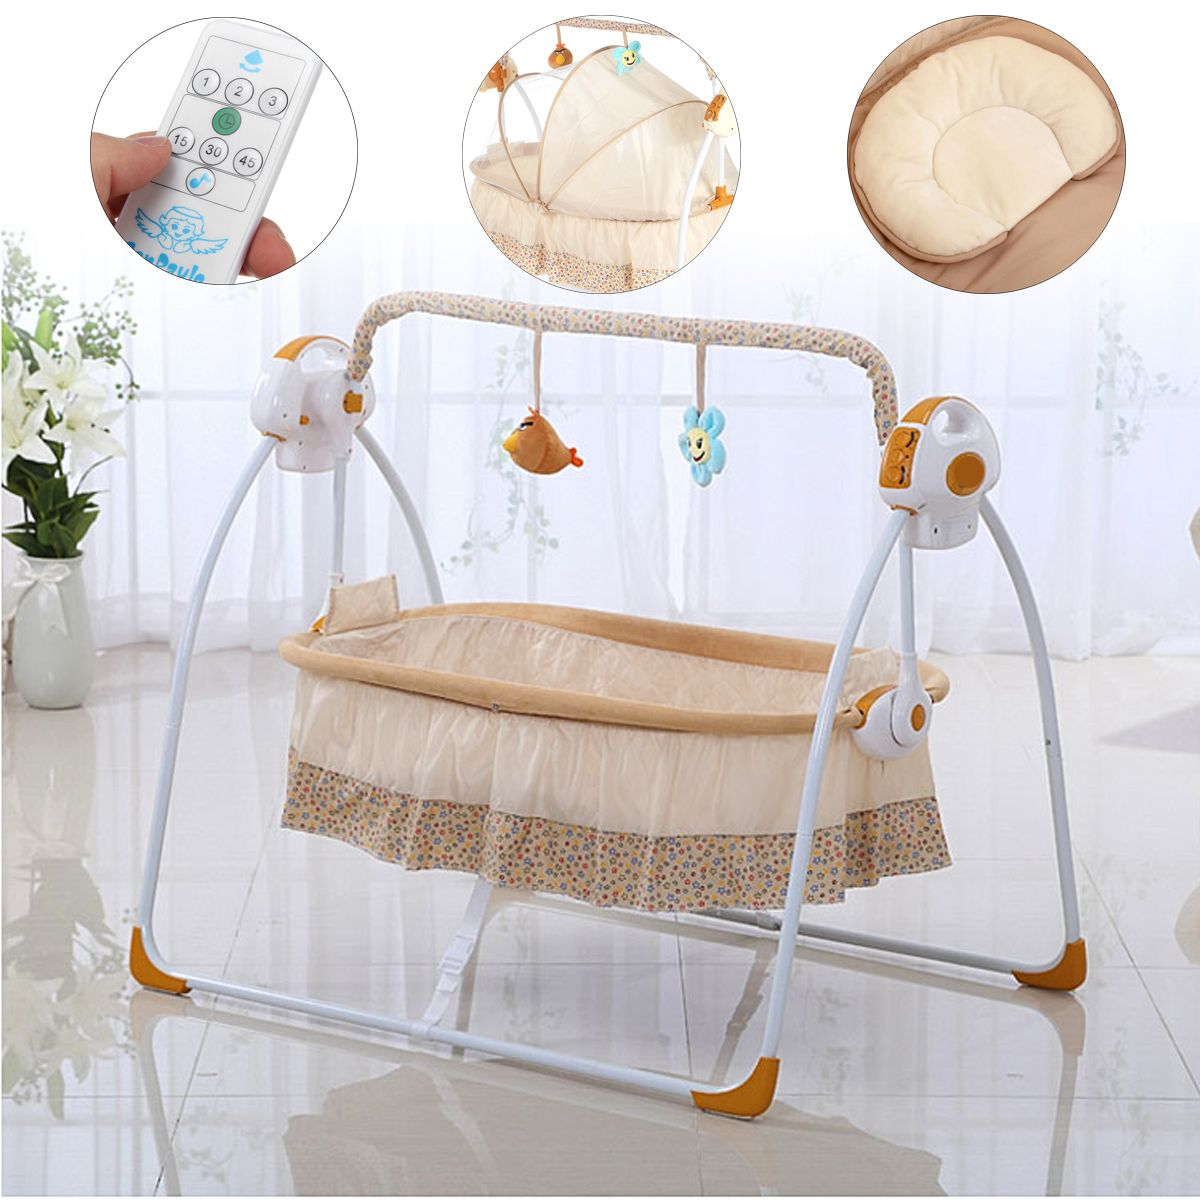 Smart Electric Baby Crib Music Cradle Infant Rocker Auto-Swing Sleep Bed Baby